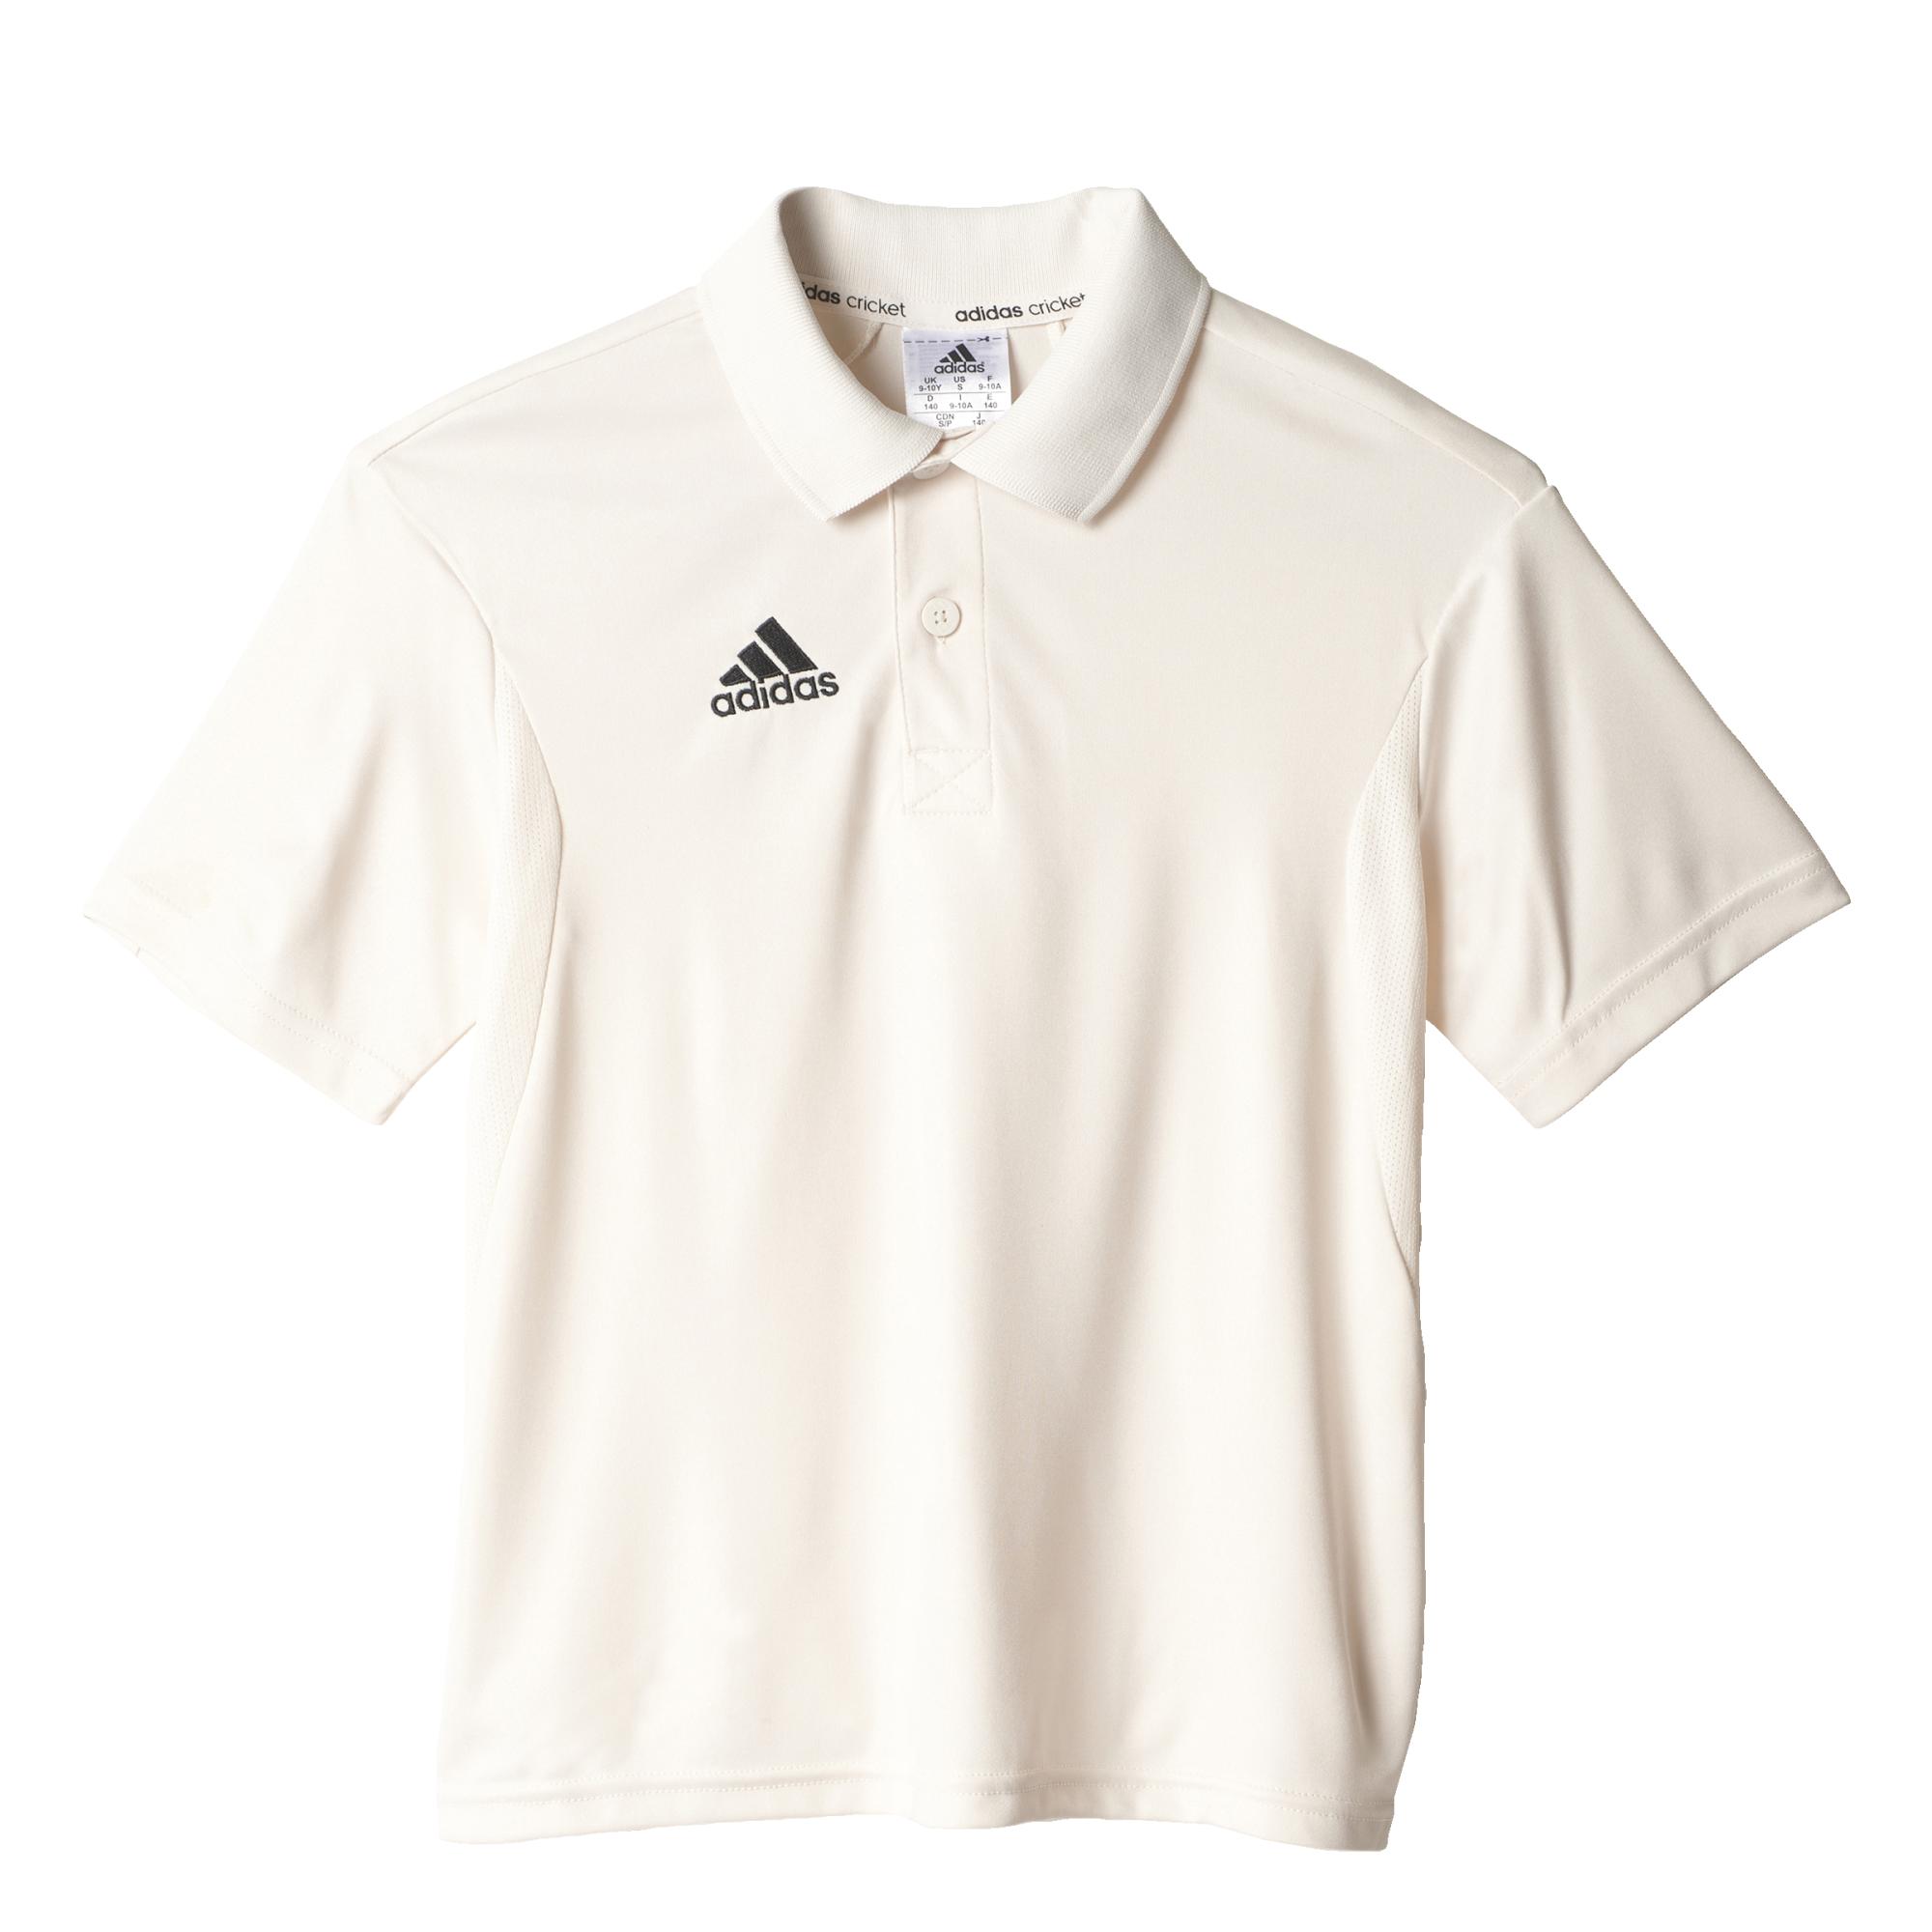 Adidas Howzat Short Sleeve Junior Playing Shirt